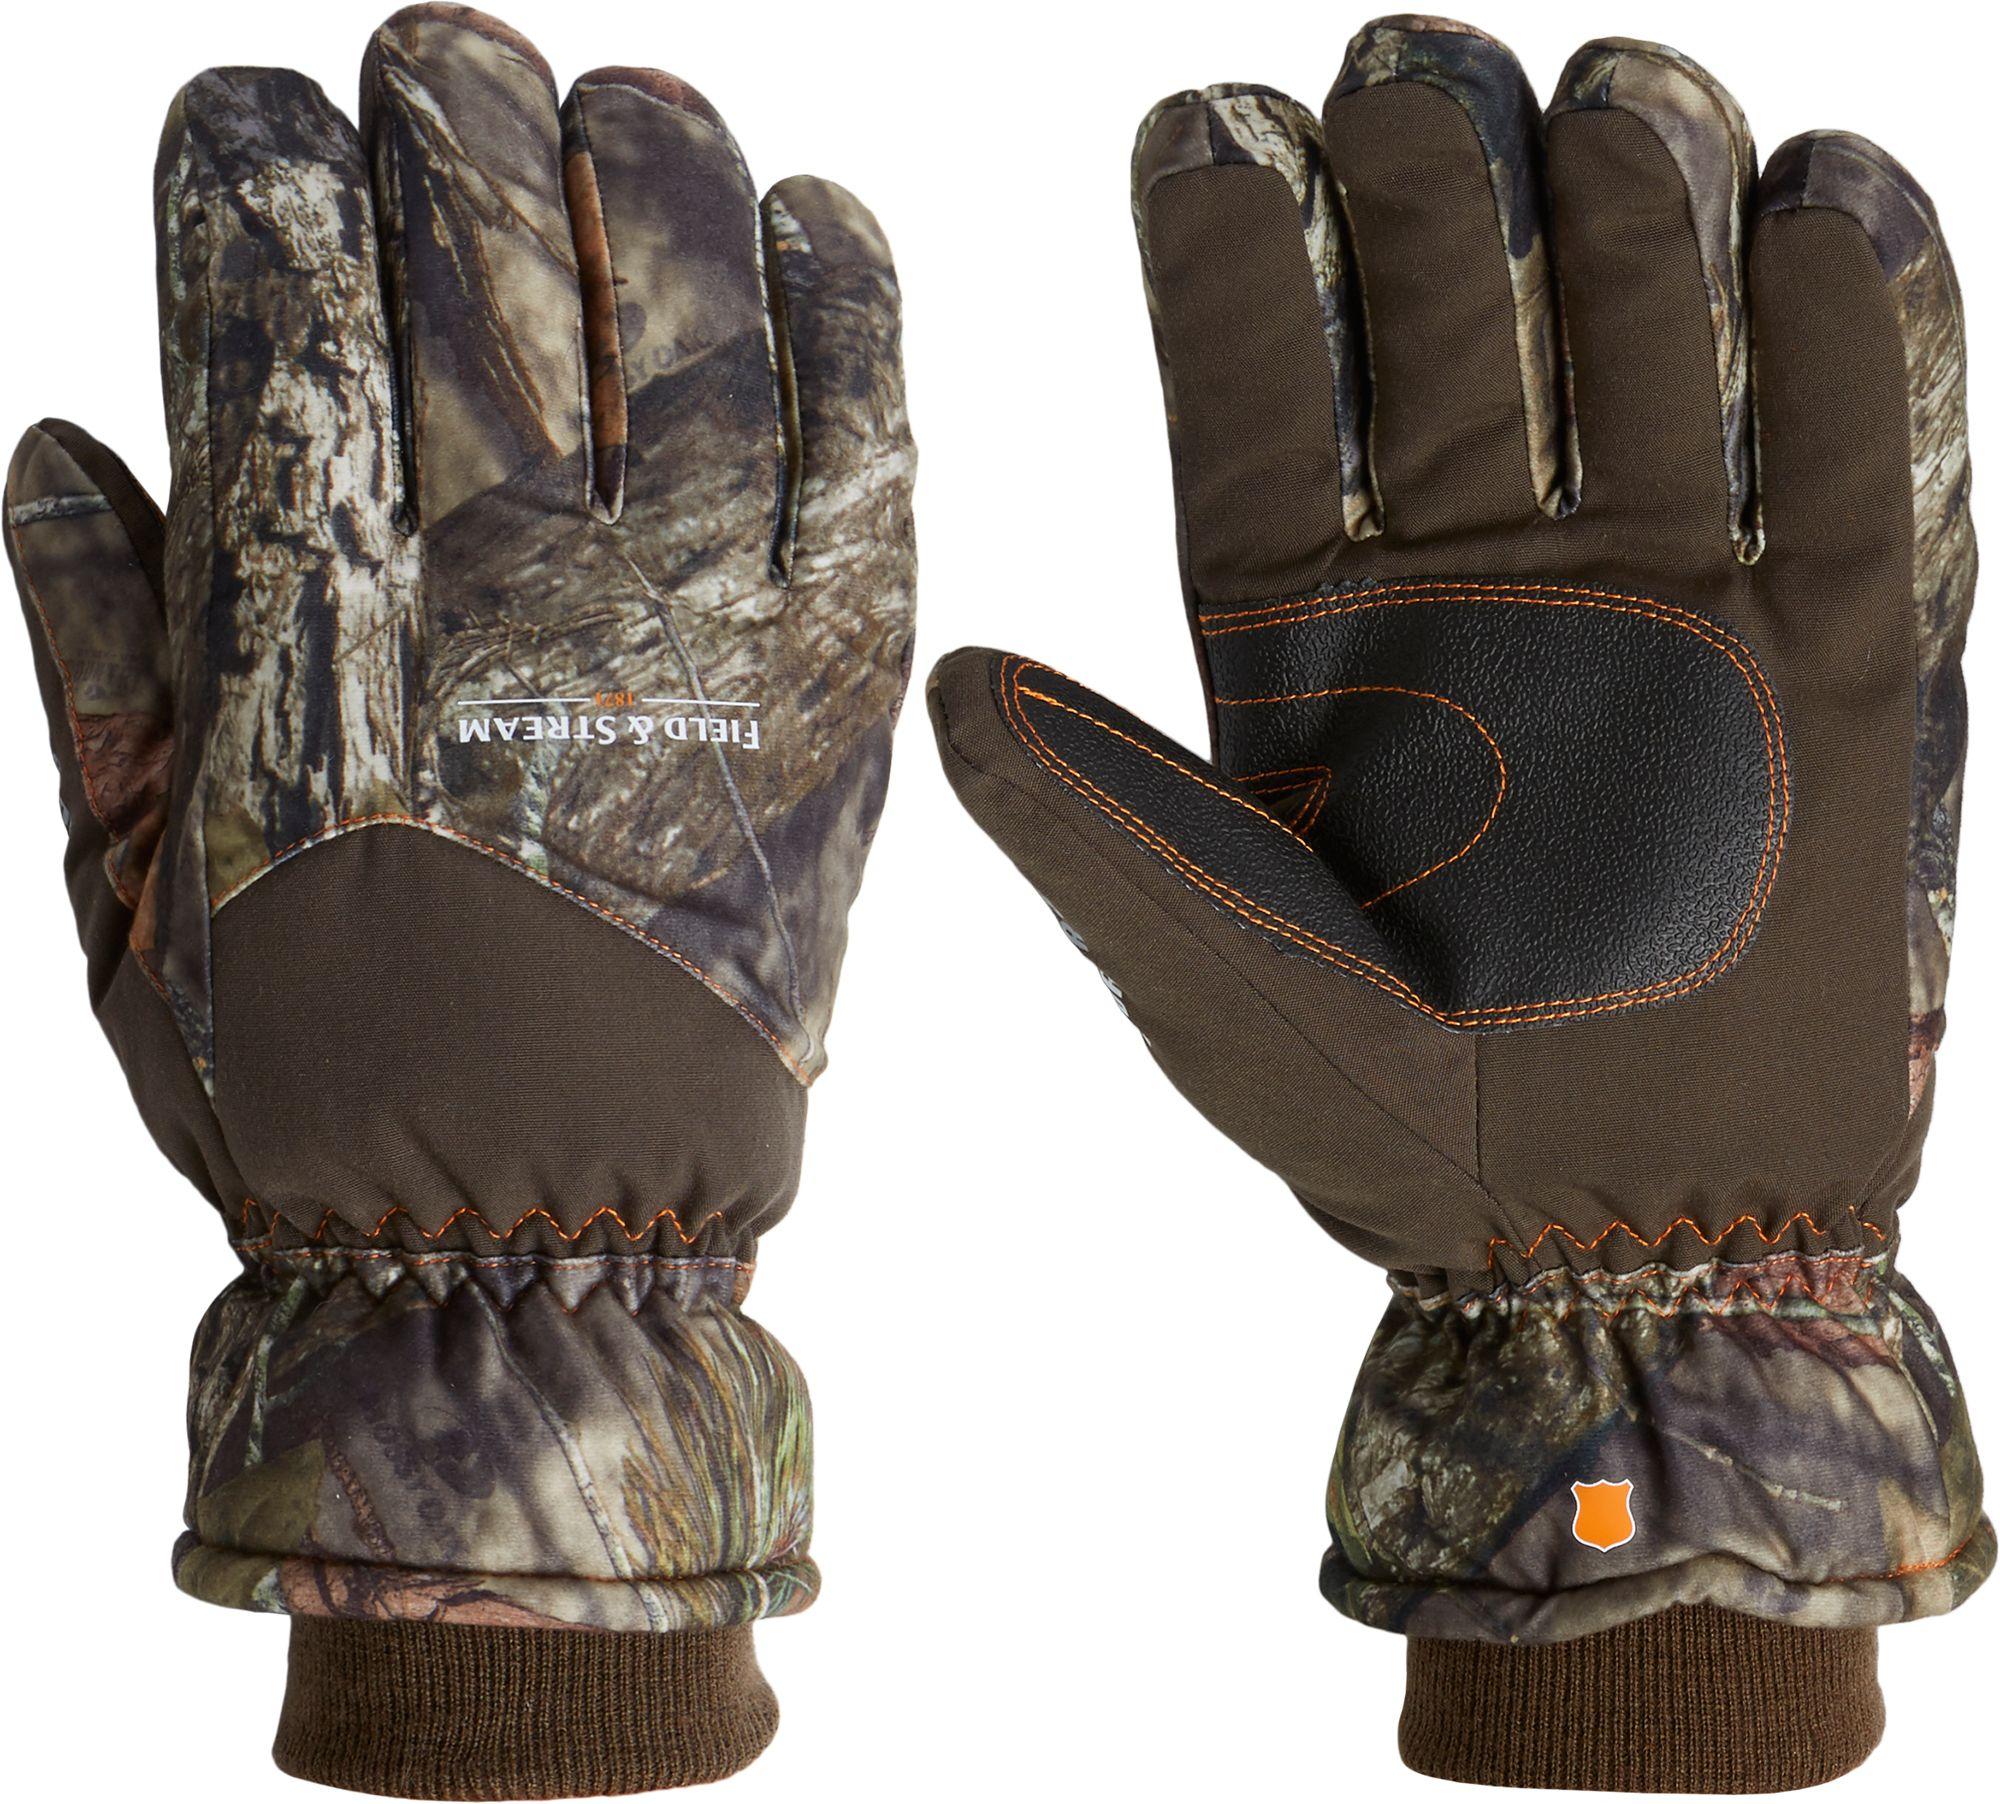 Field & Stream Men's Pursuit Hunting Glove, Size: Medium, Multi